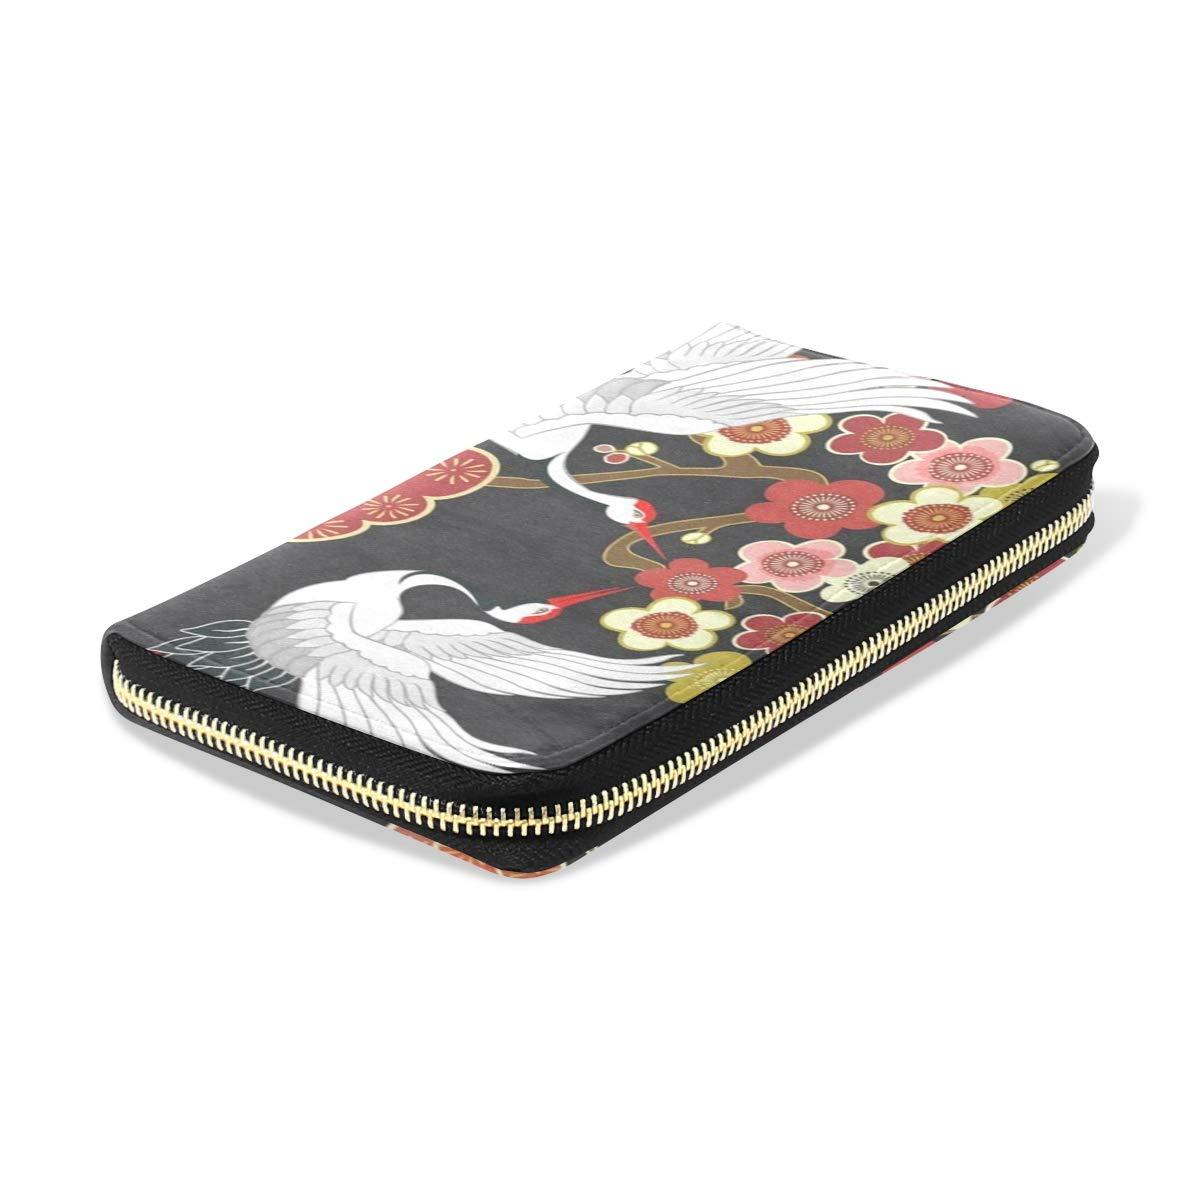 Womens Wallets Flying Bird Cherry Blossom Leather Passport Wallet Coin Purse Girls Handbags